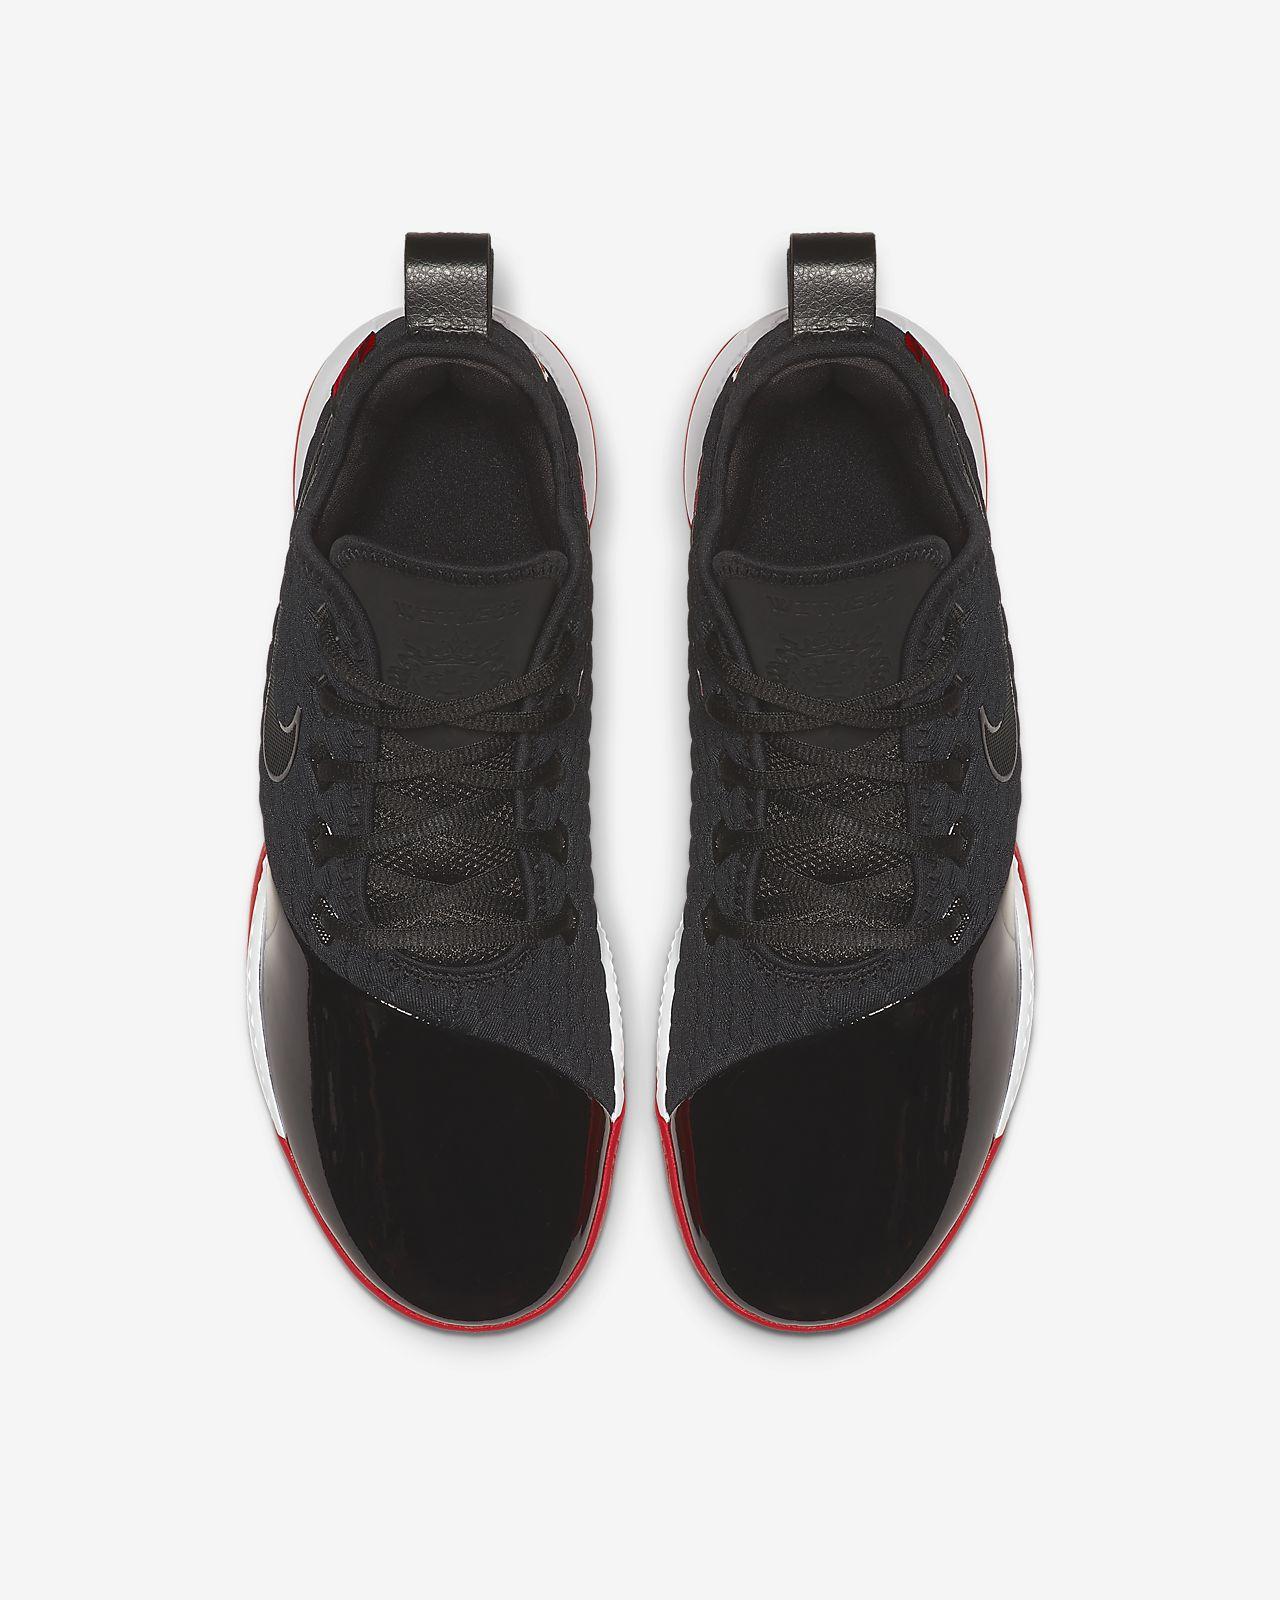 c049d70fc Scarpa da basket LeBron Witness III PRM - Uomo. Nike.com CH